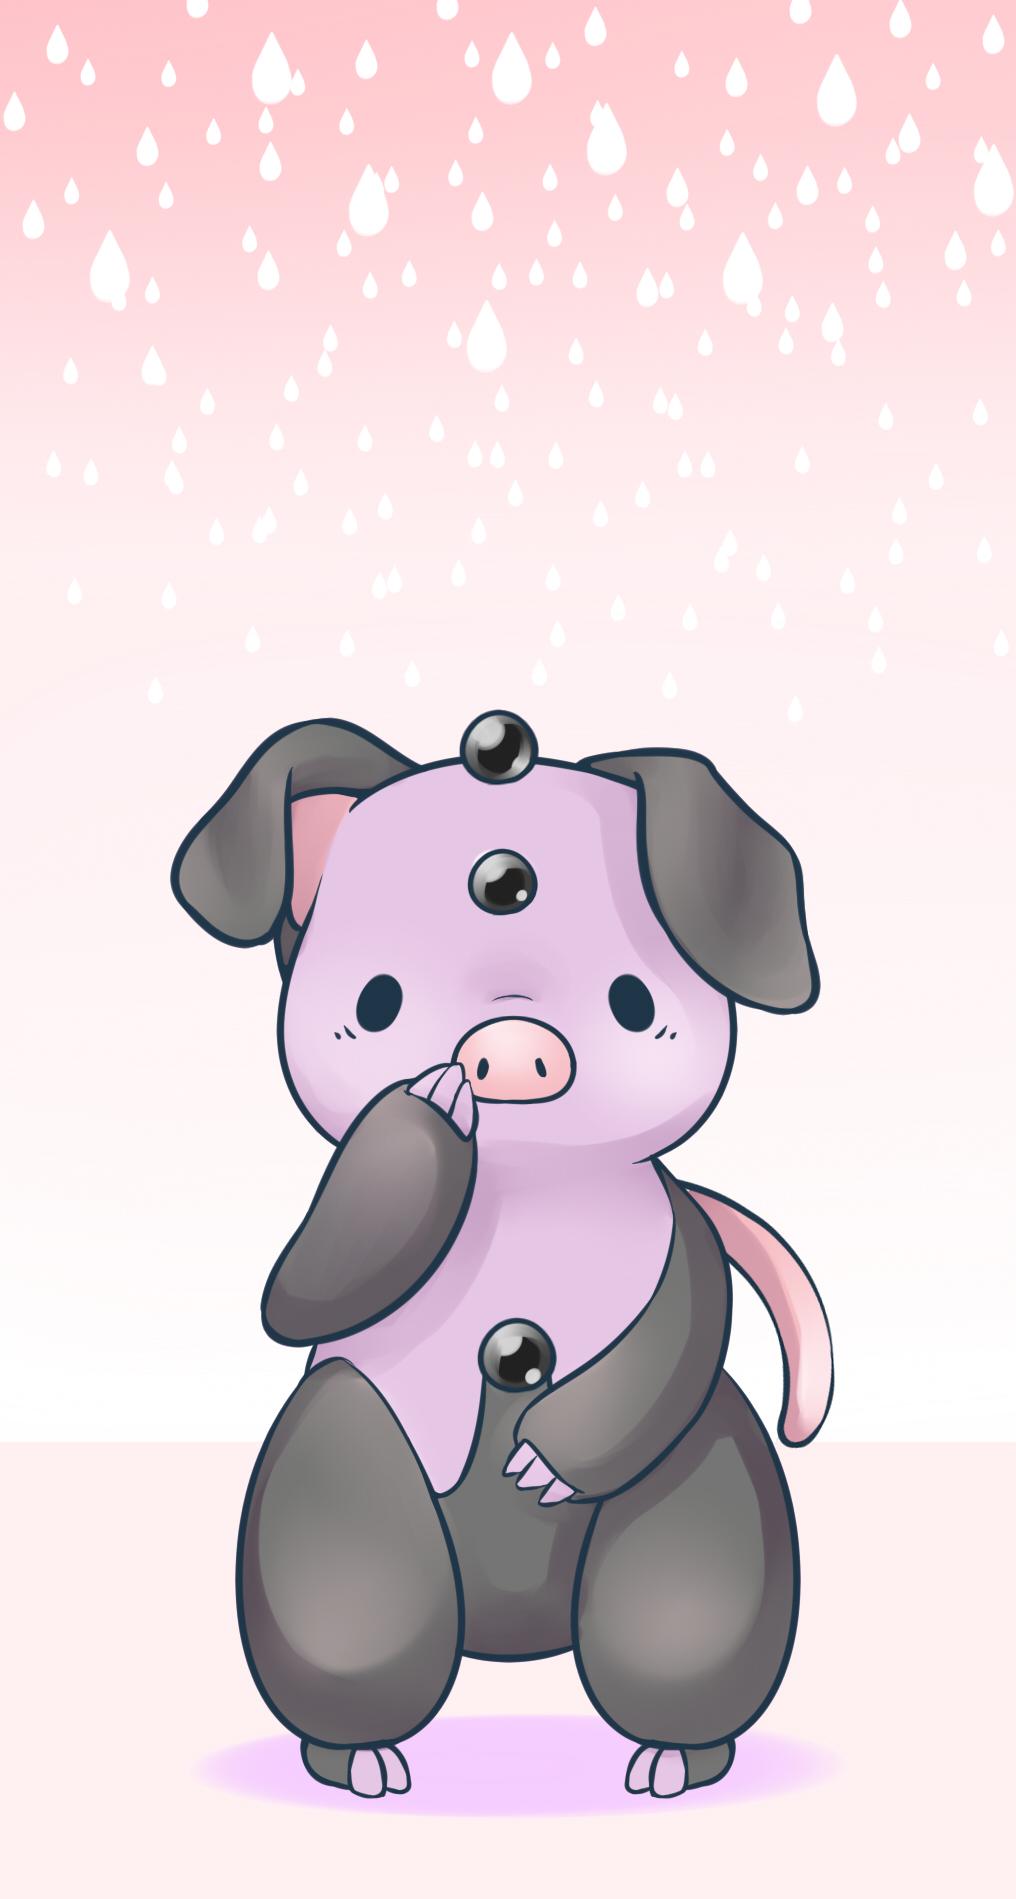 Grumpig - Pokémon - Image #2041205 - Zerochan Anime Image ...